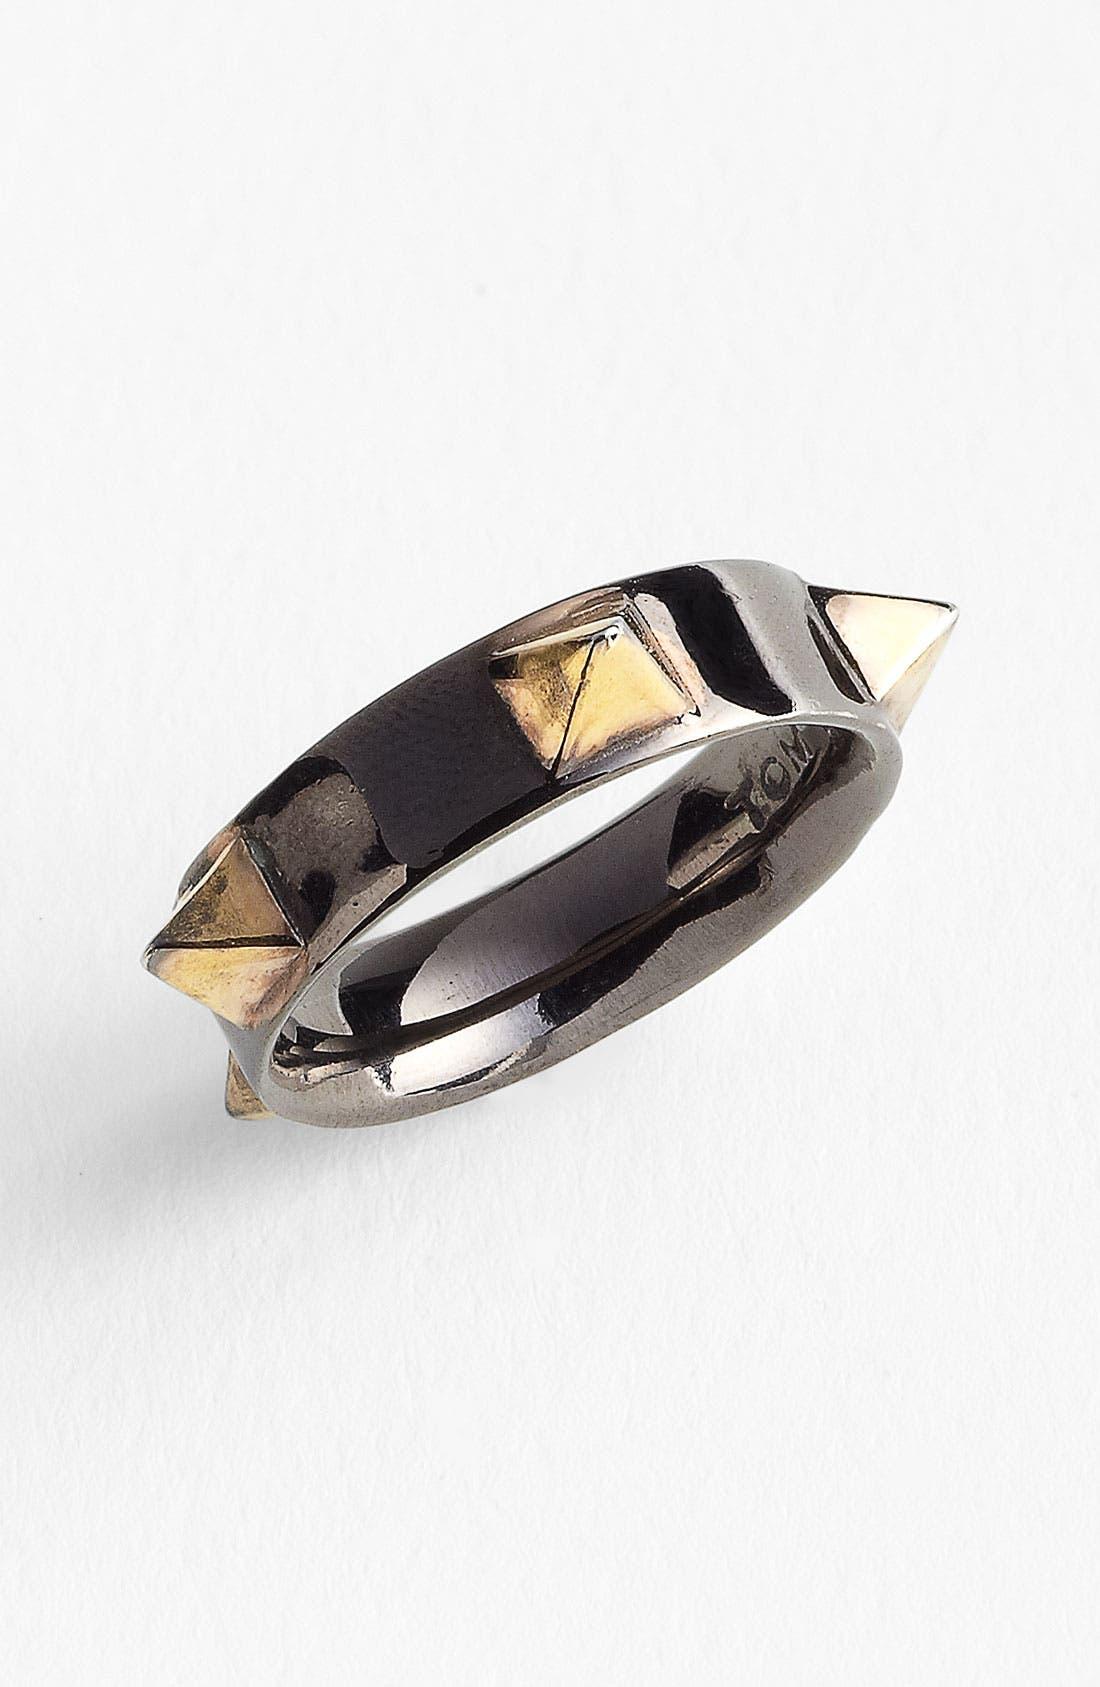 Main Image - Tom Binns 'Protopunk' Stud Ring